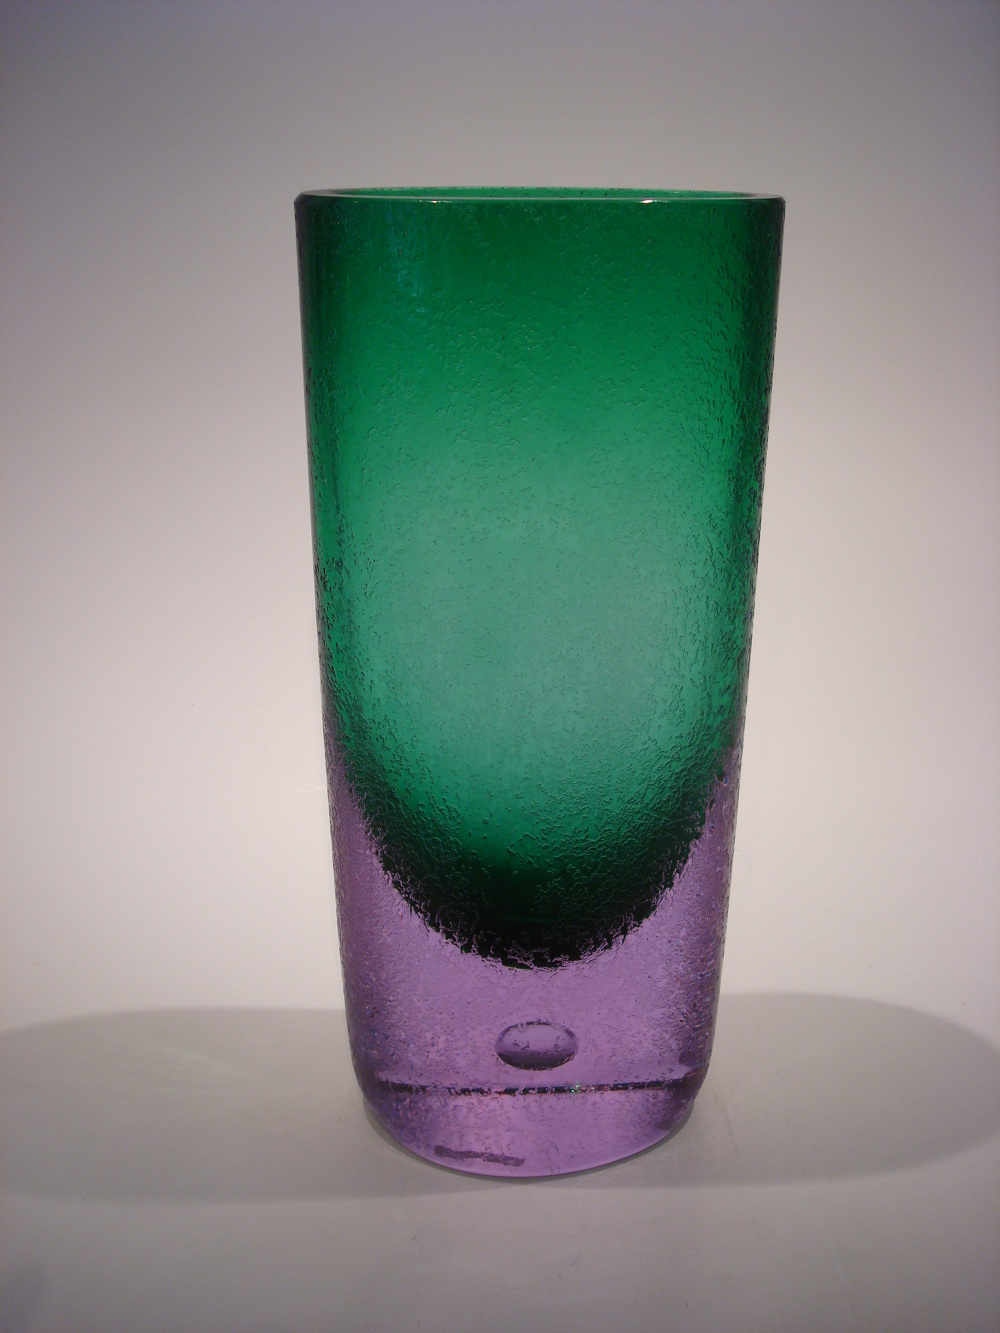 Glass vase corroso by renzo burchiellaro 1960 wowllery reviewsmspy